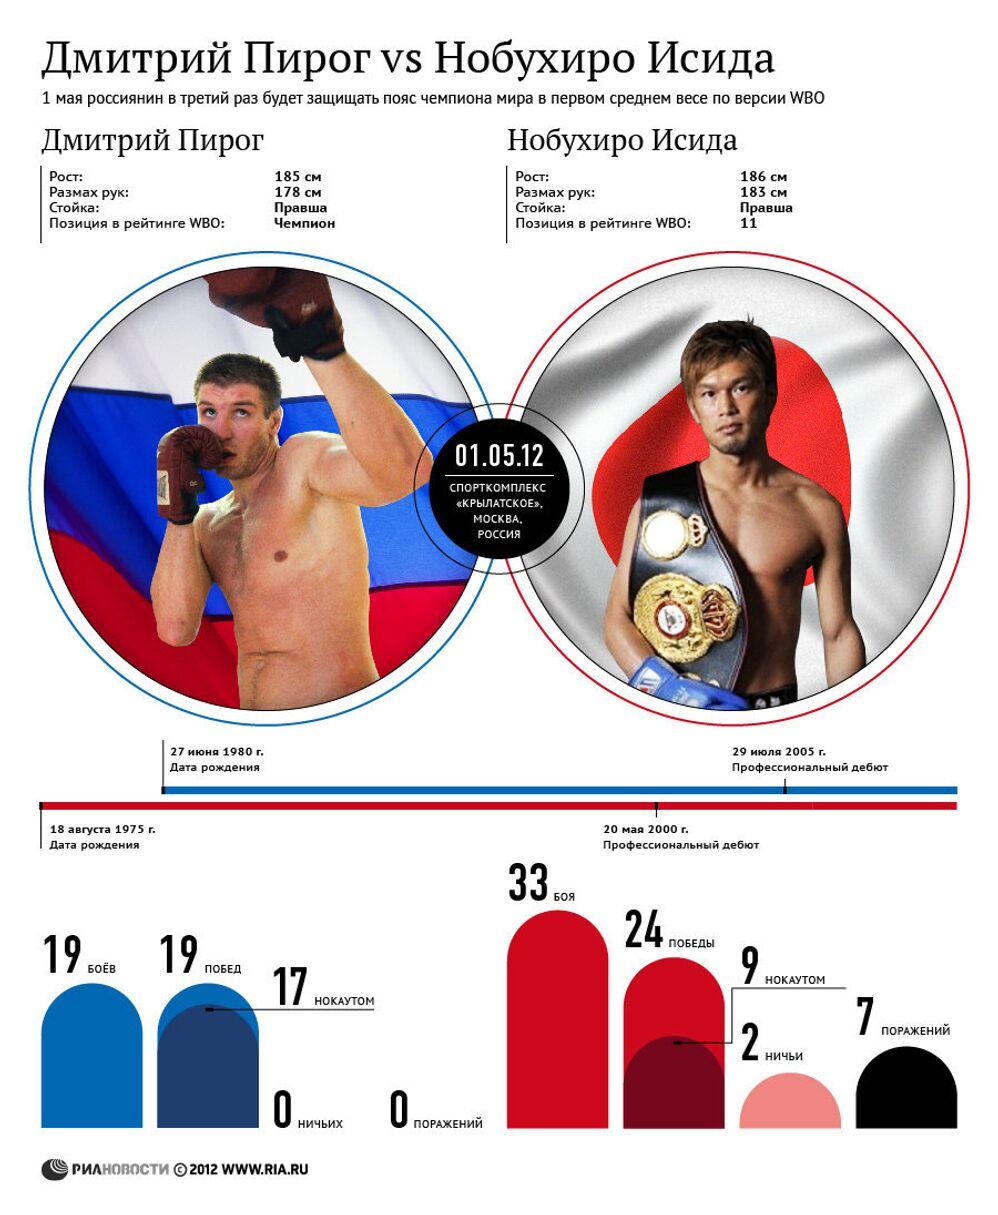 Дмитрий Пирог против Нобухиро Исиды